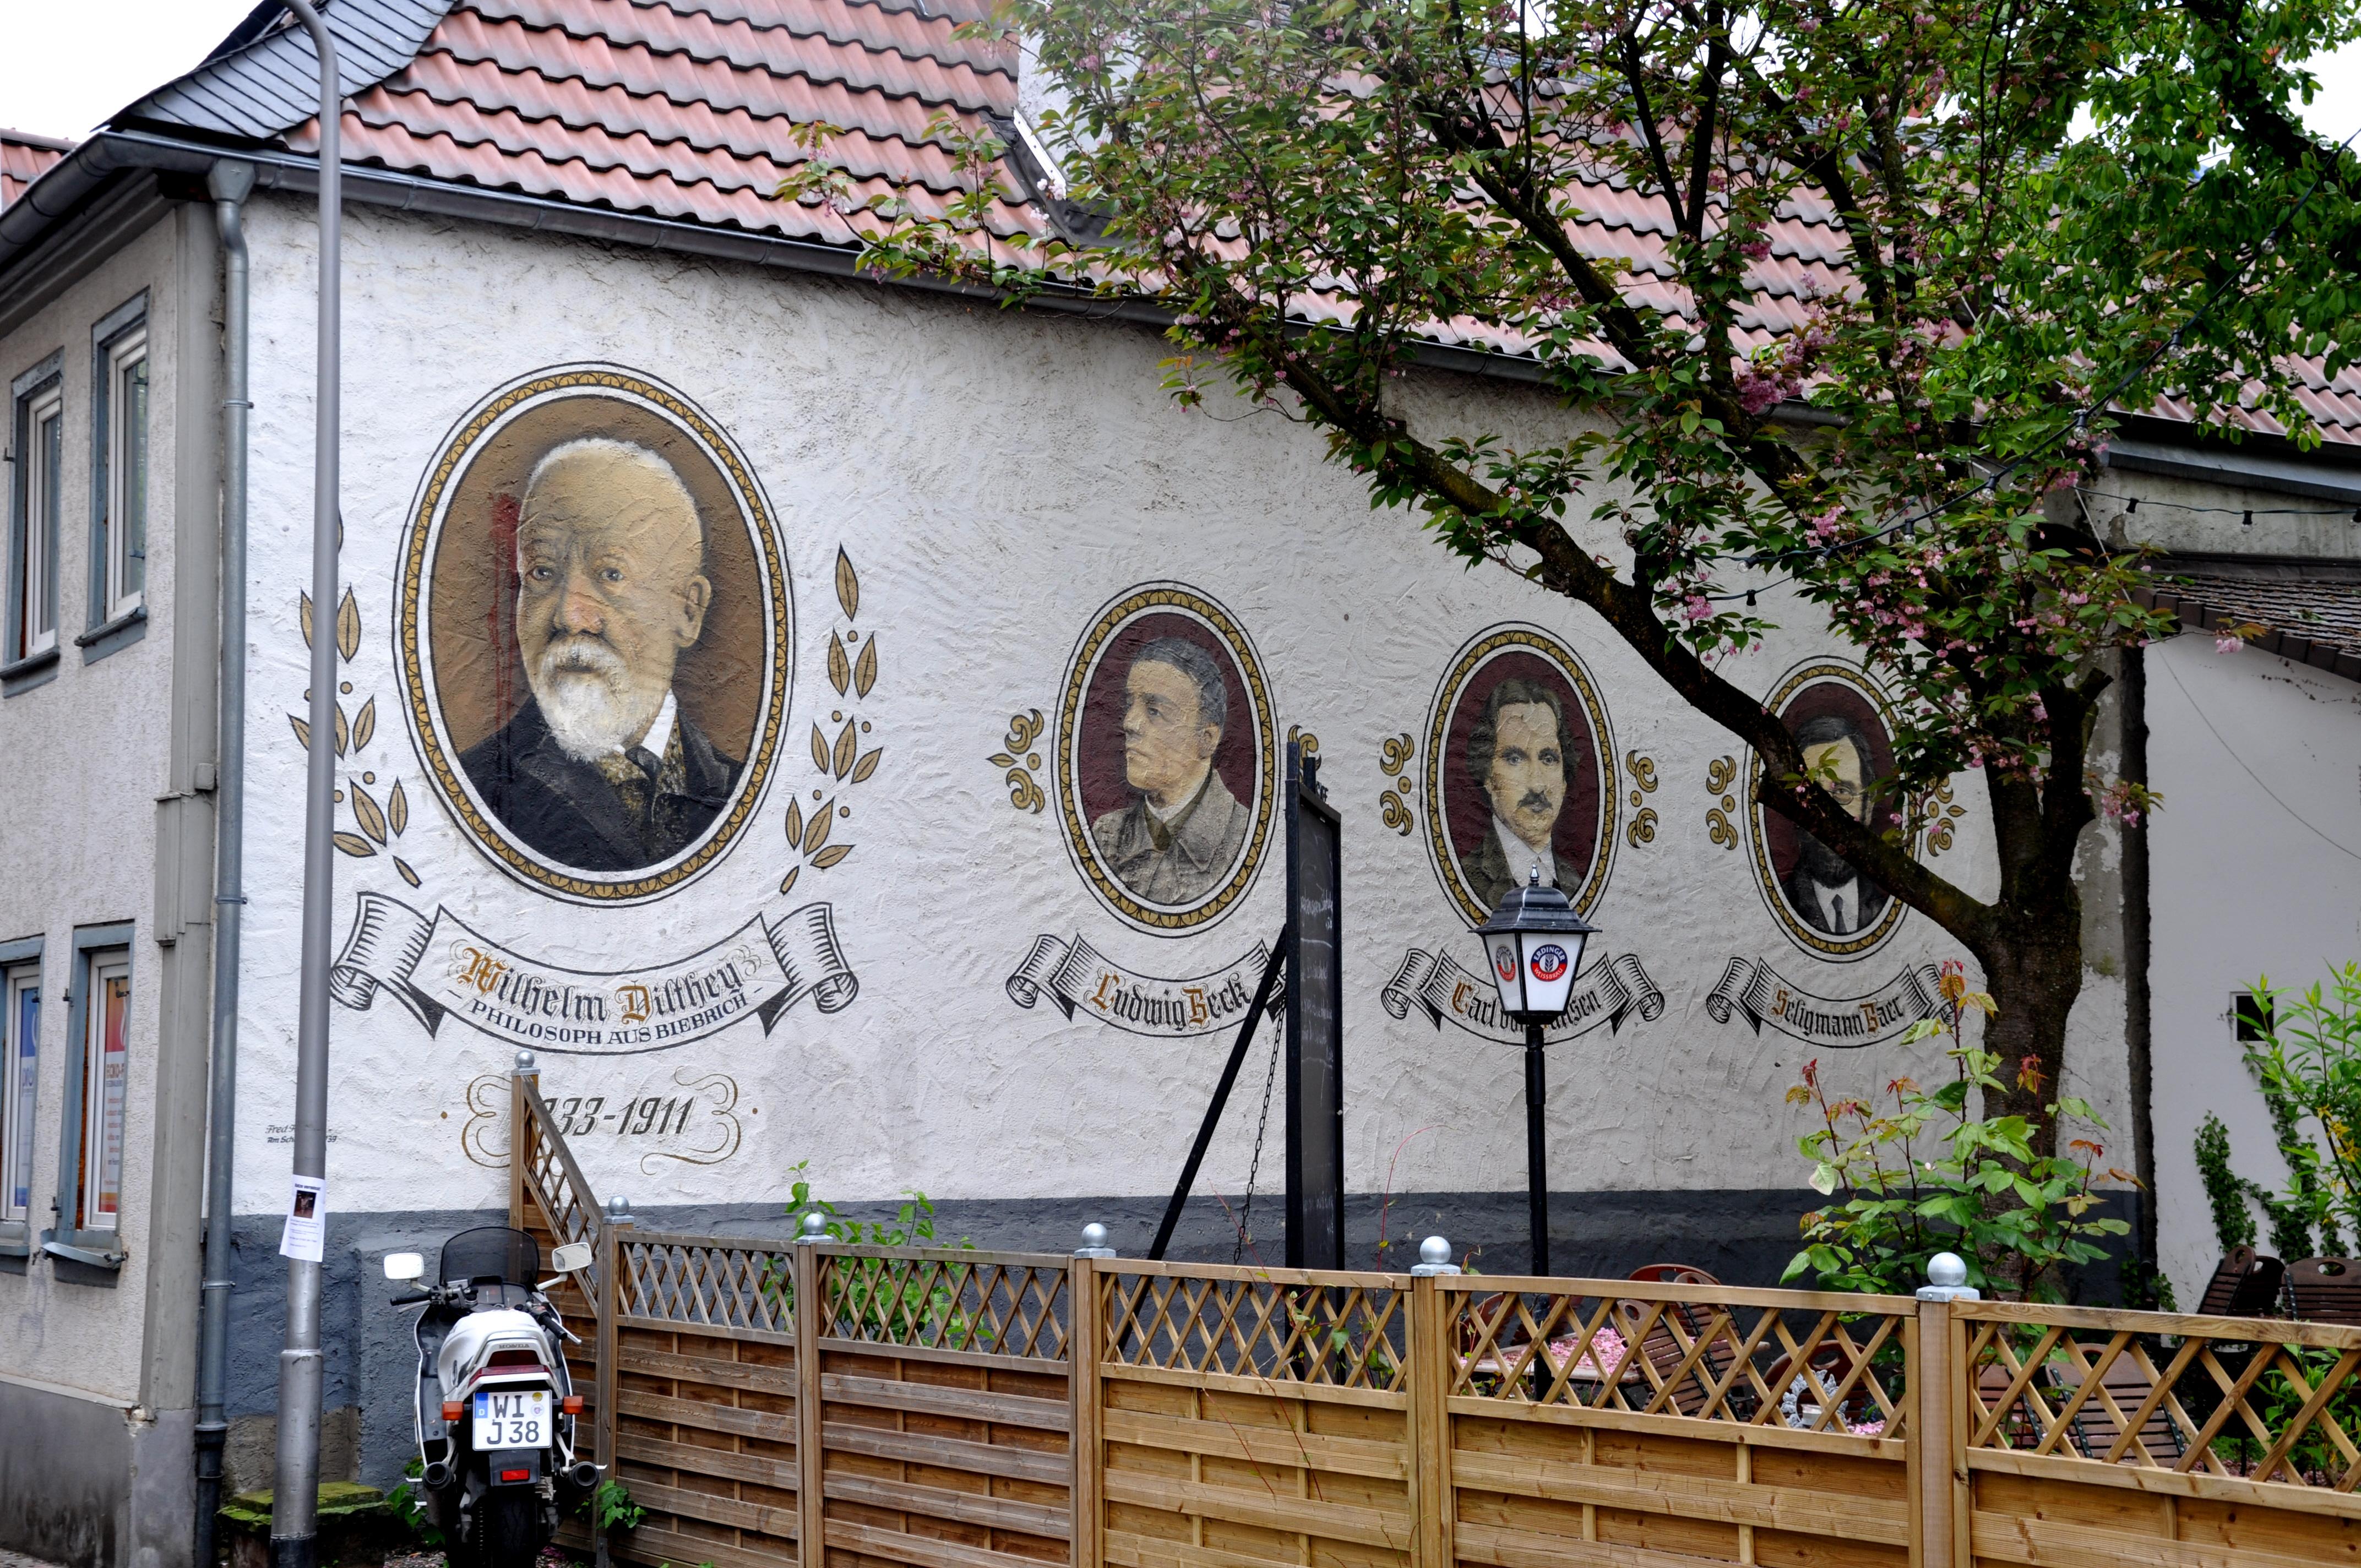 File Wiesbaden Biebrich Wandmalerei bei Dilthey Haus